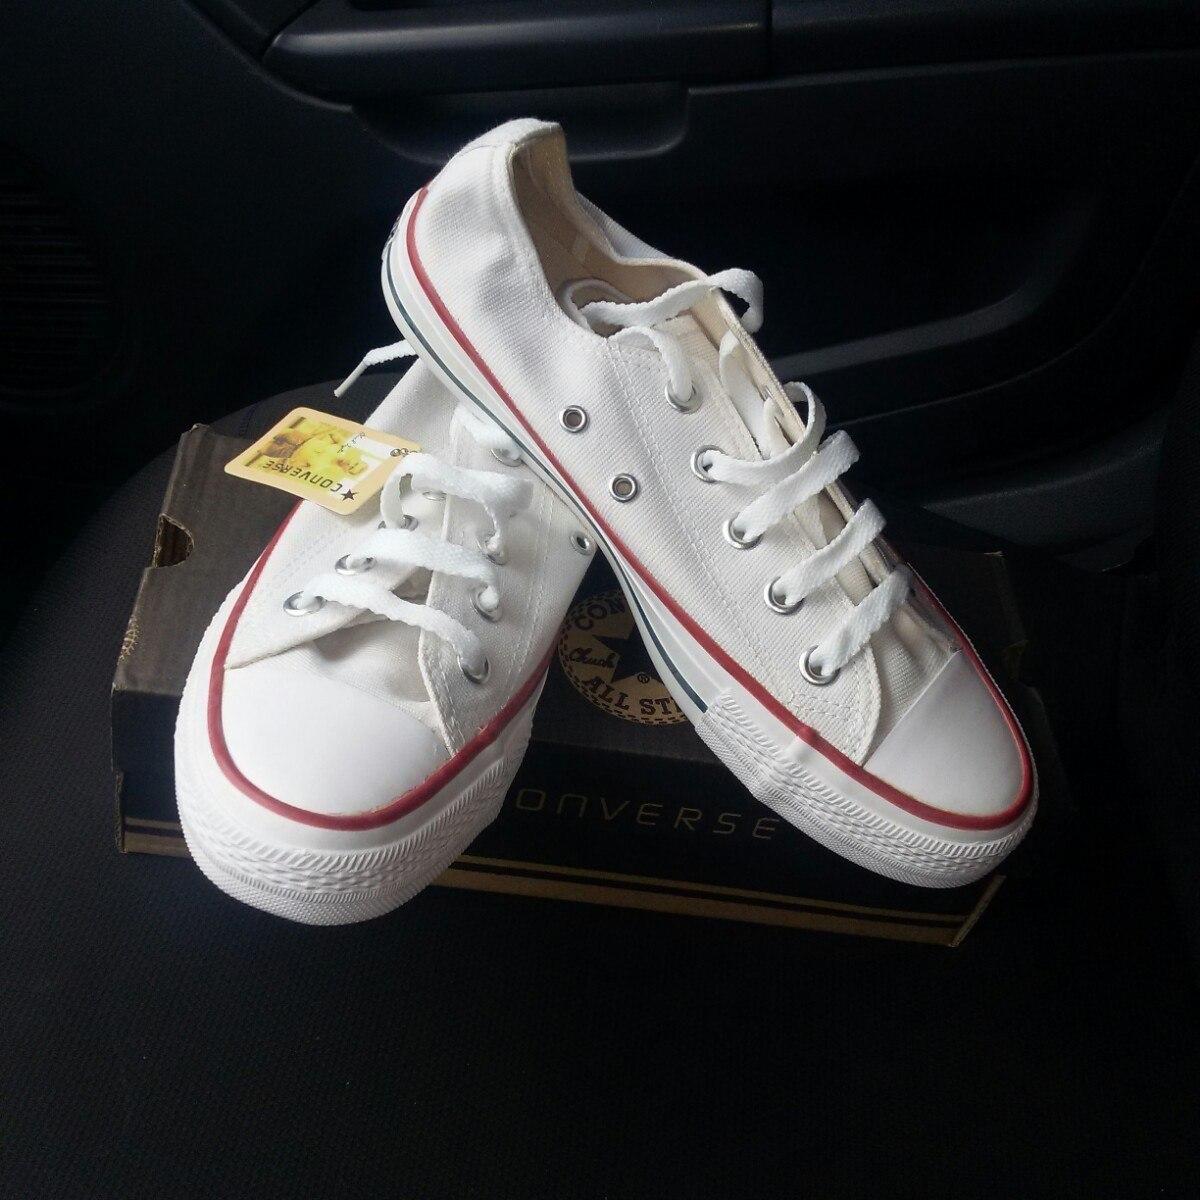 Converse Made In Vietnam Saleup To 52 Discounts Sepatu Chuck Taylor 2 Original